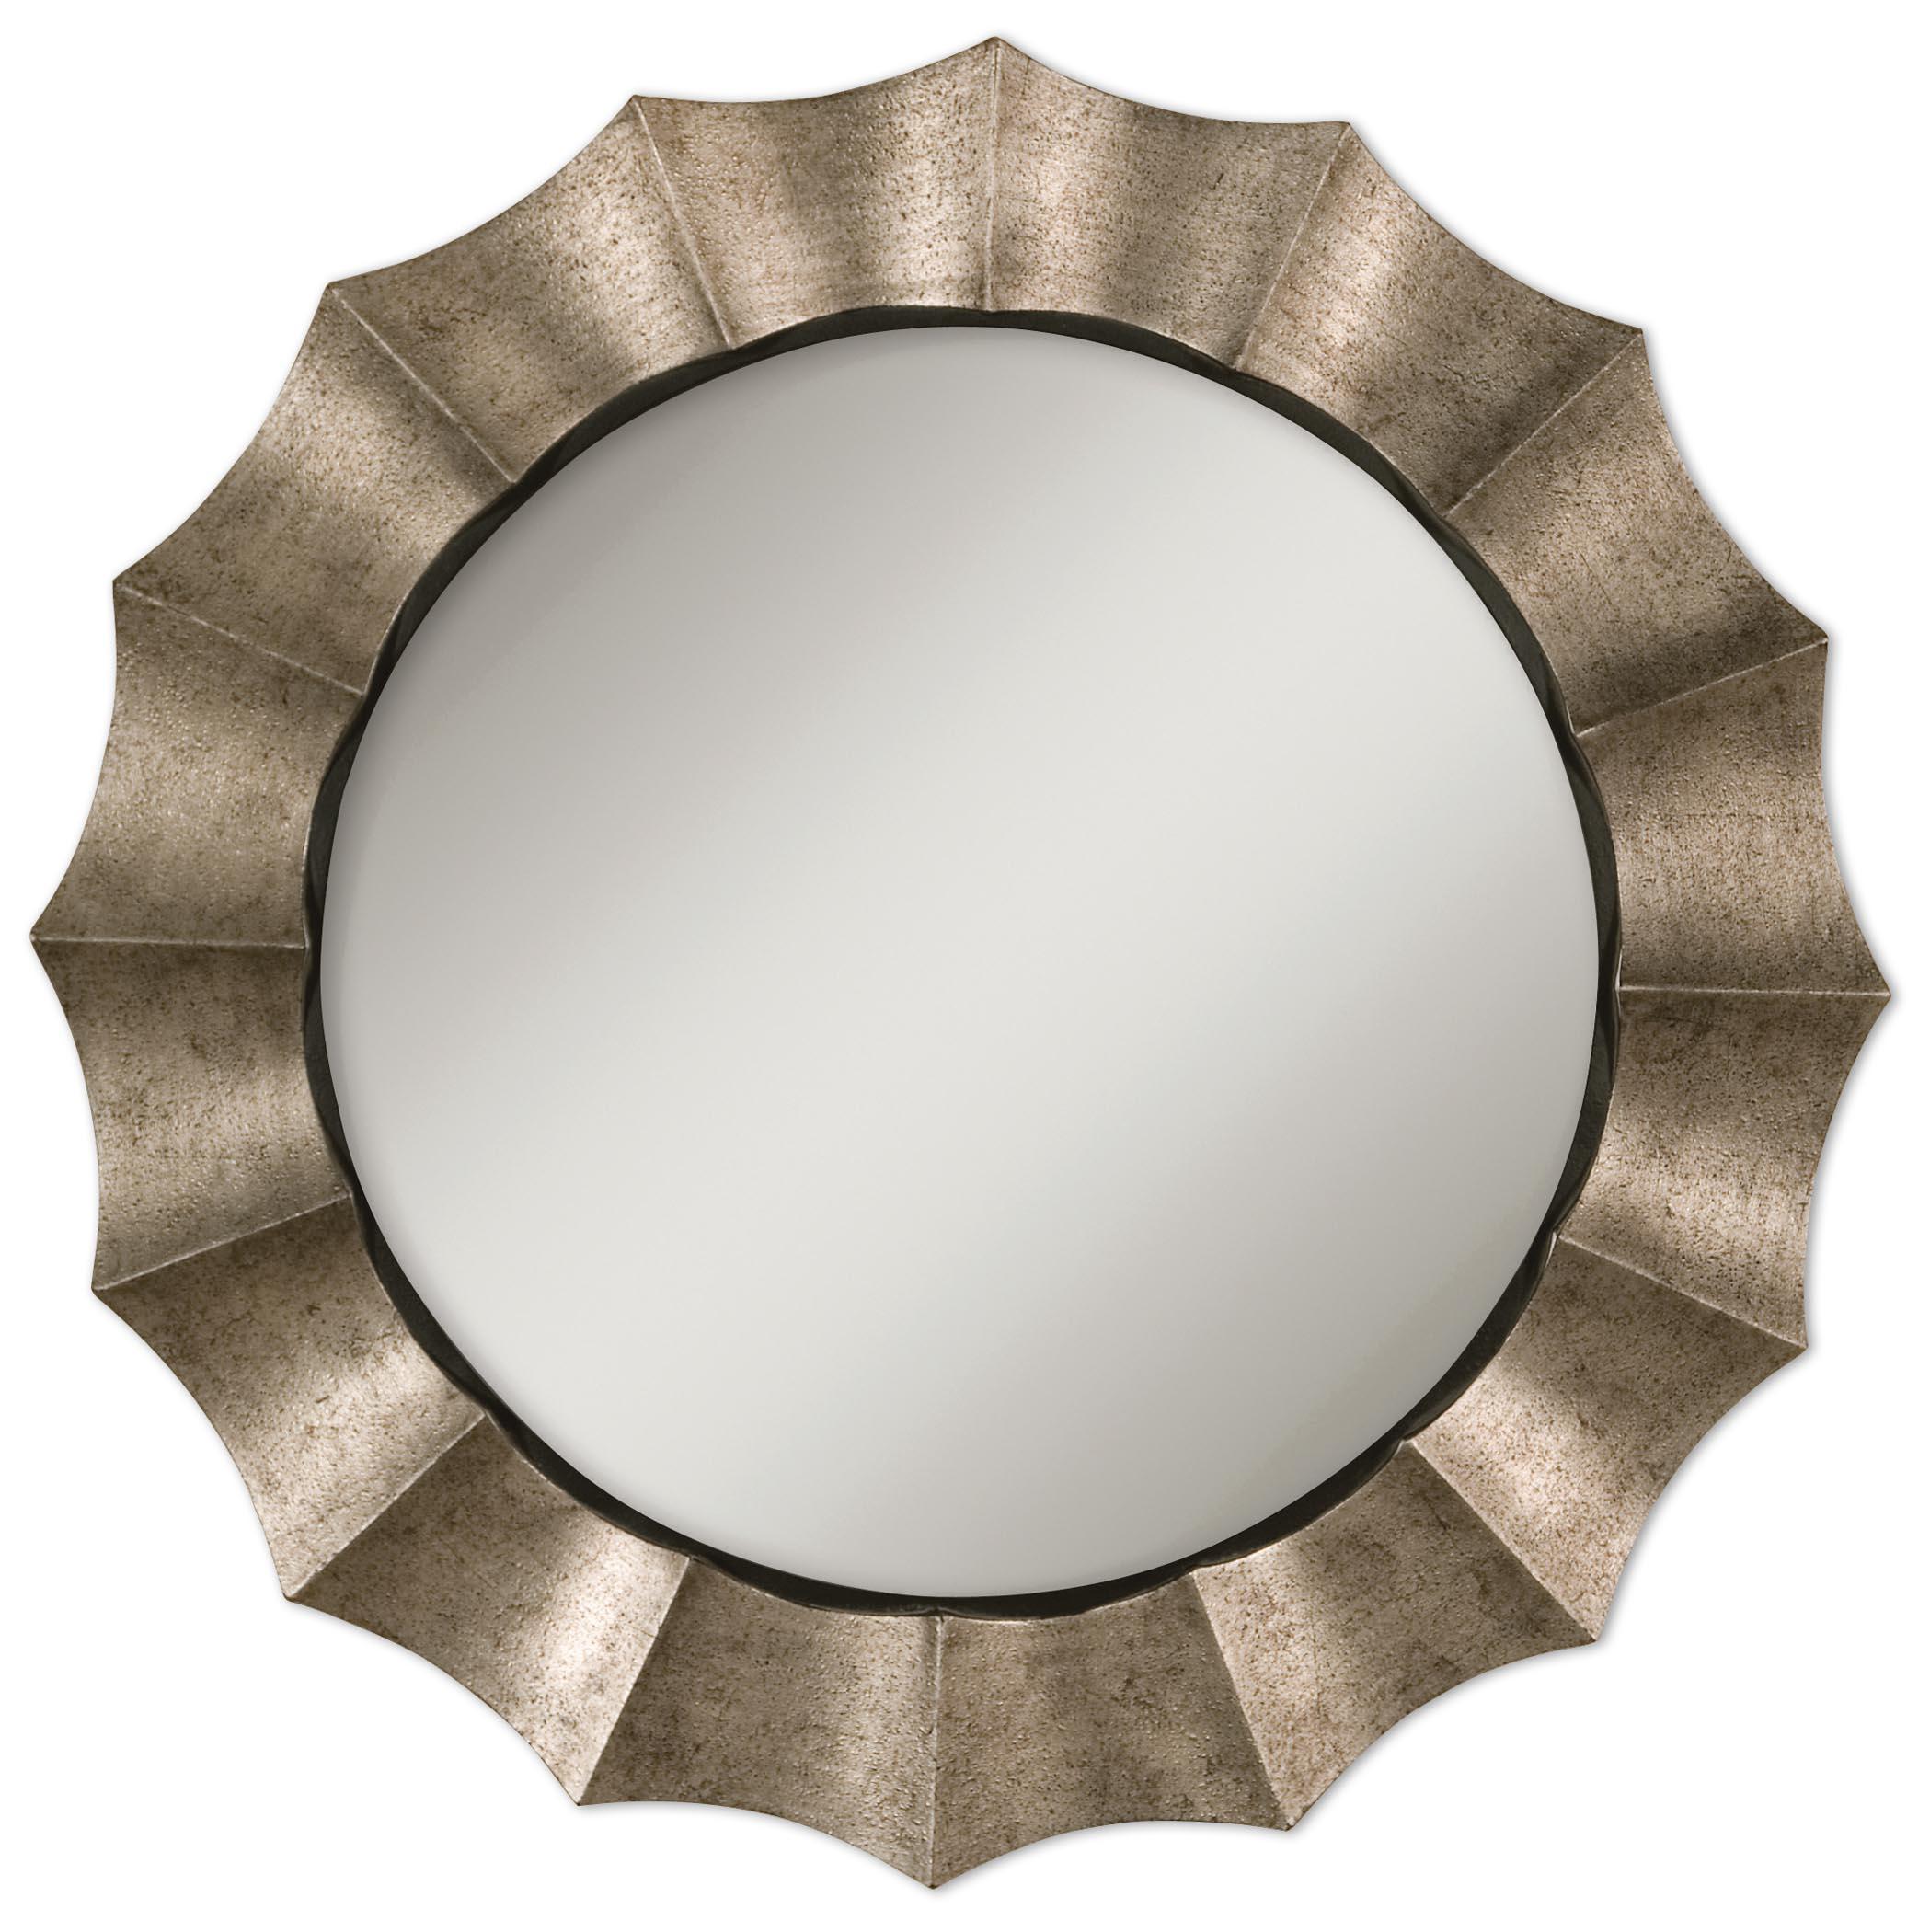 Uttermost Mirrors Gotham U Mirror - Item Number: 06048 P